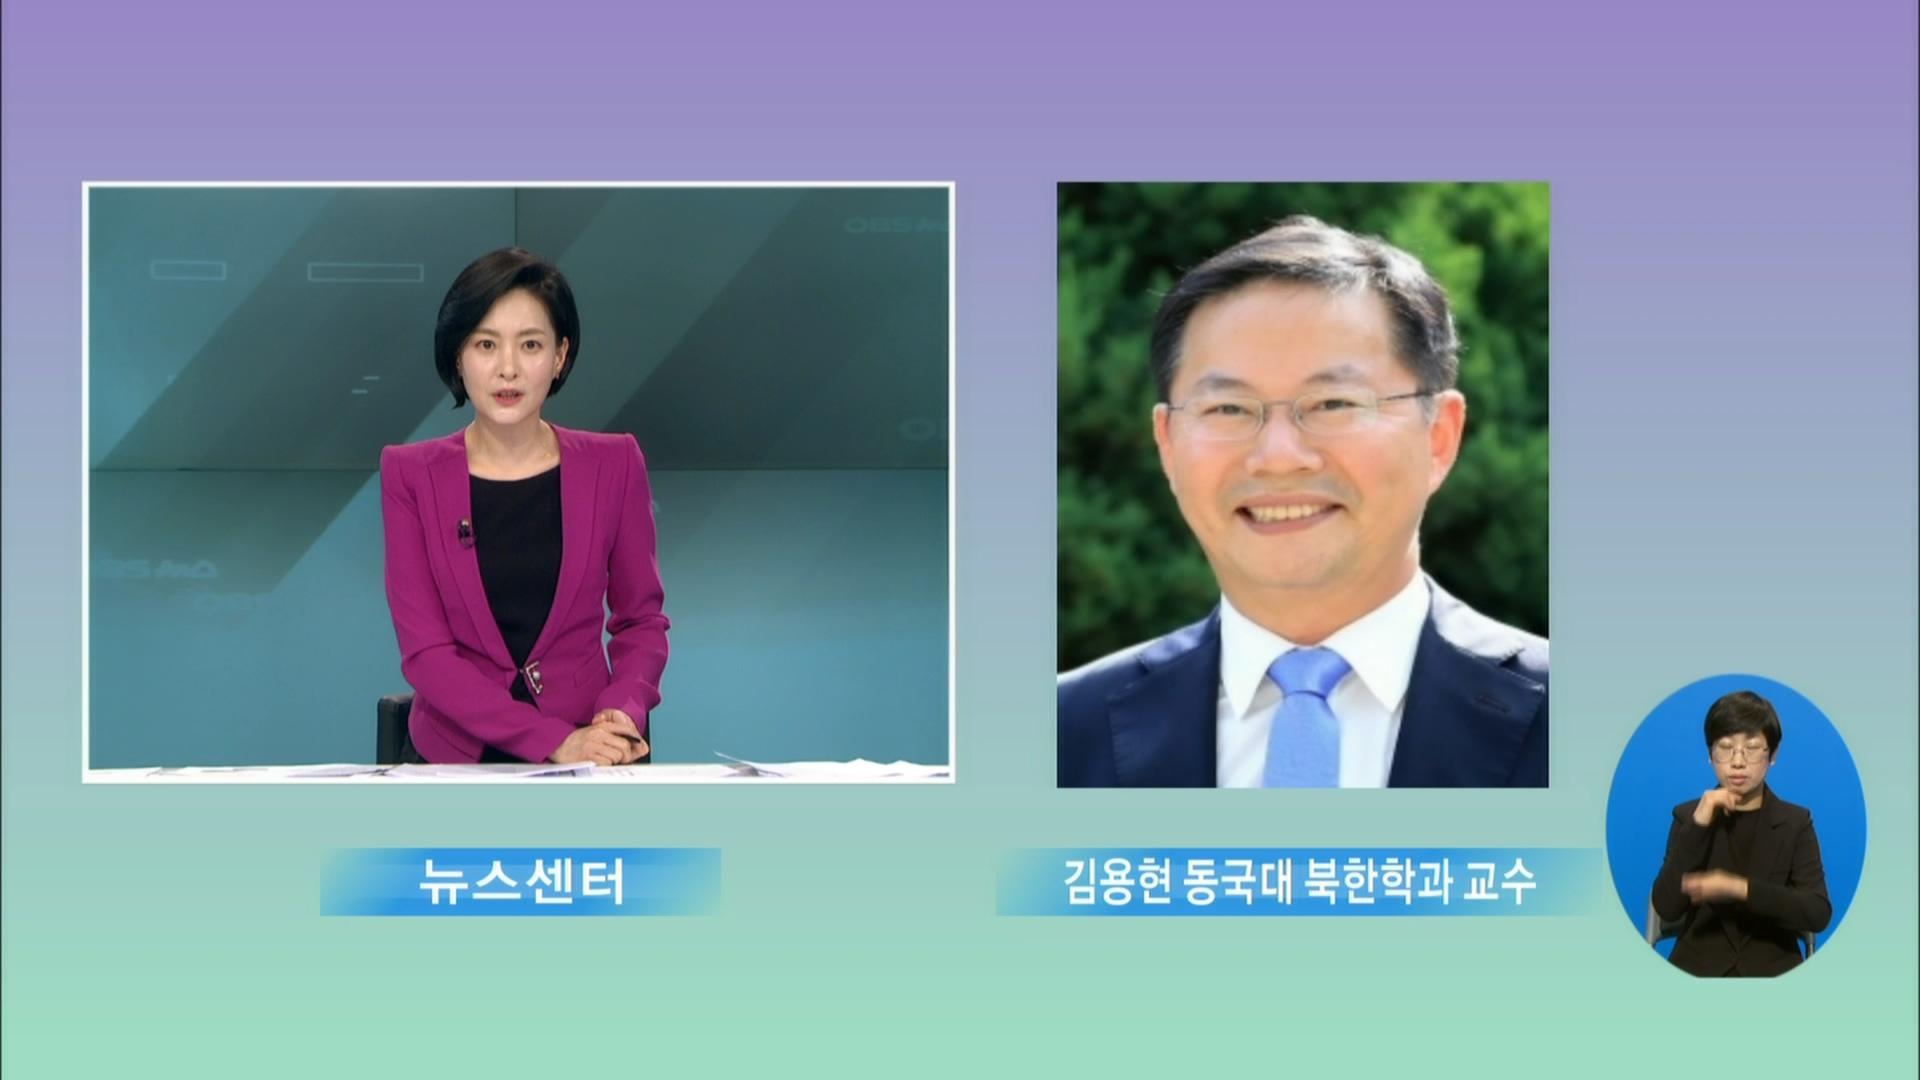 [OBS 전격인터뷰] 김정은 불참 속 北 최고인민회의 개최